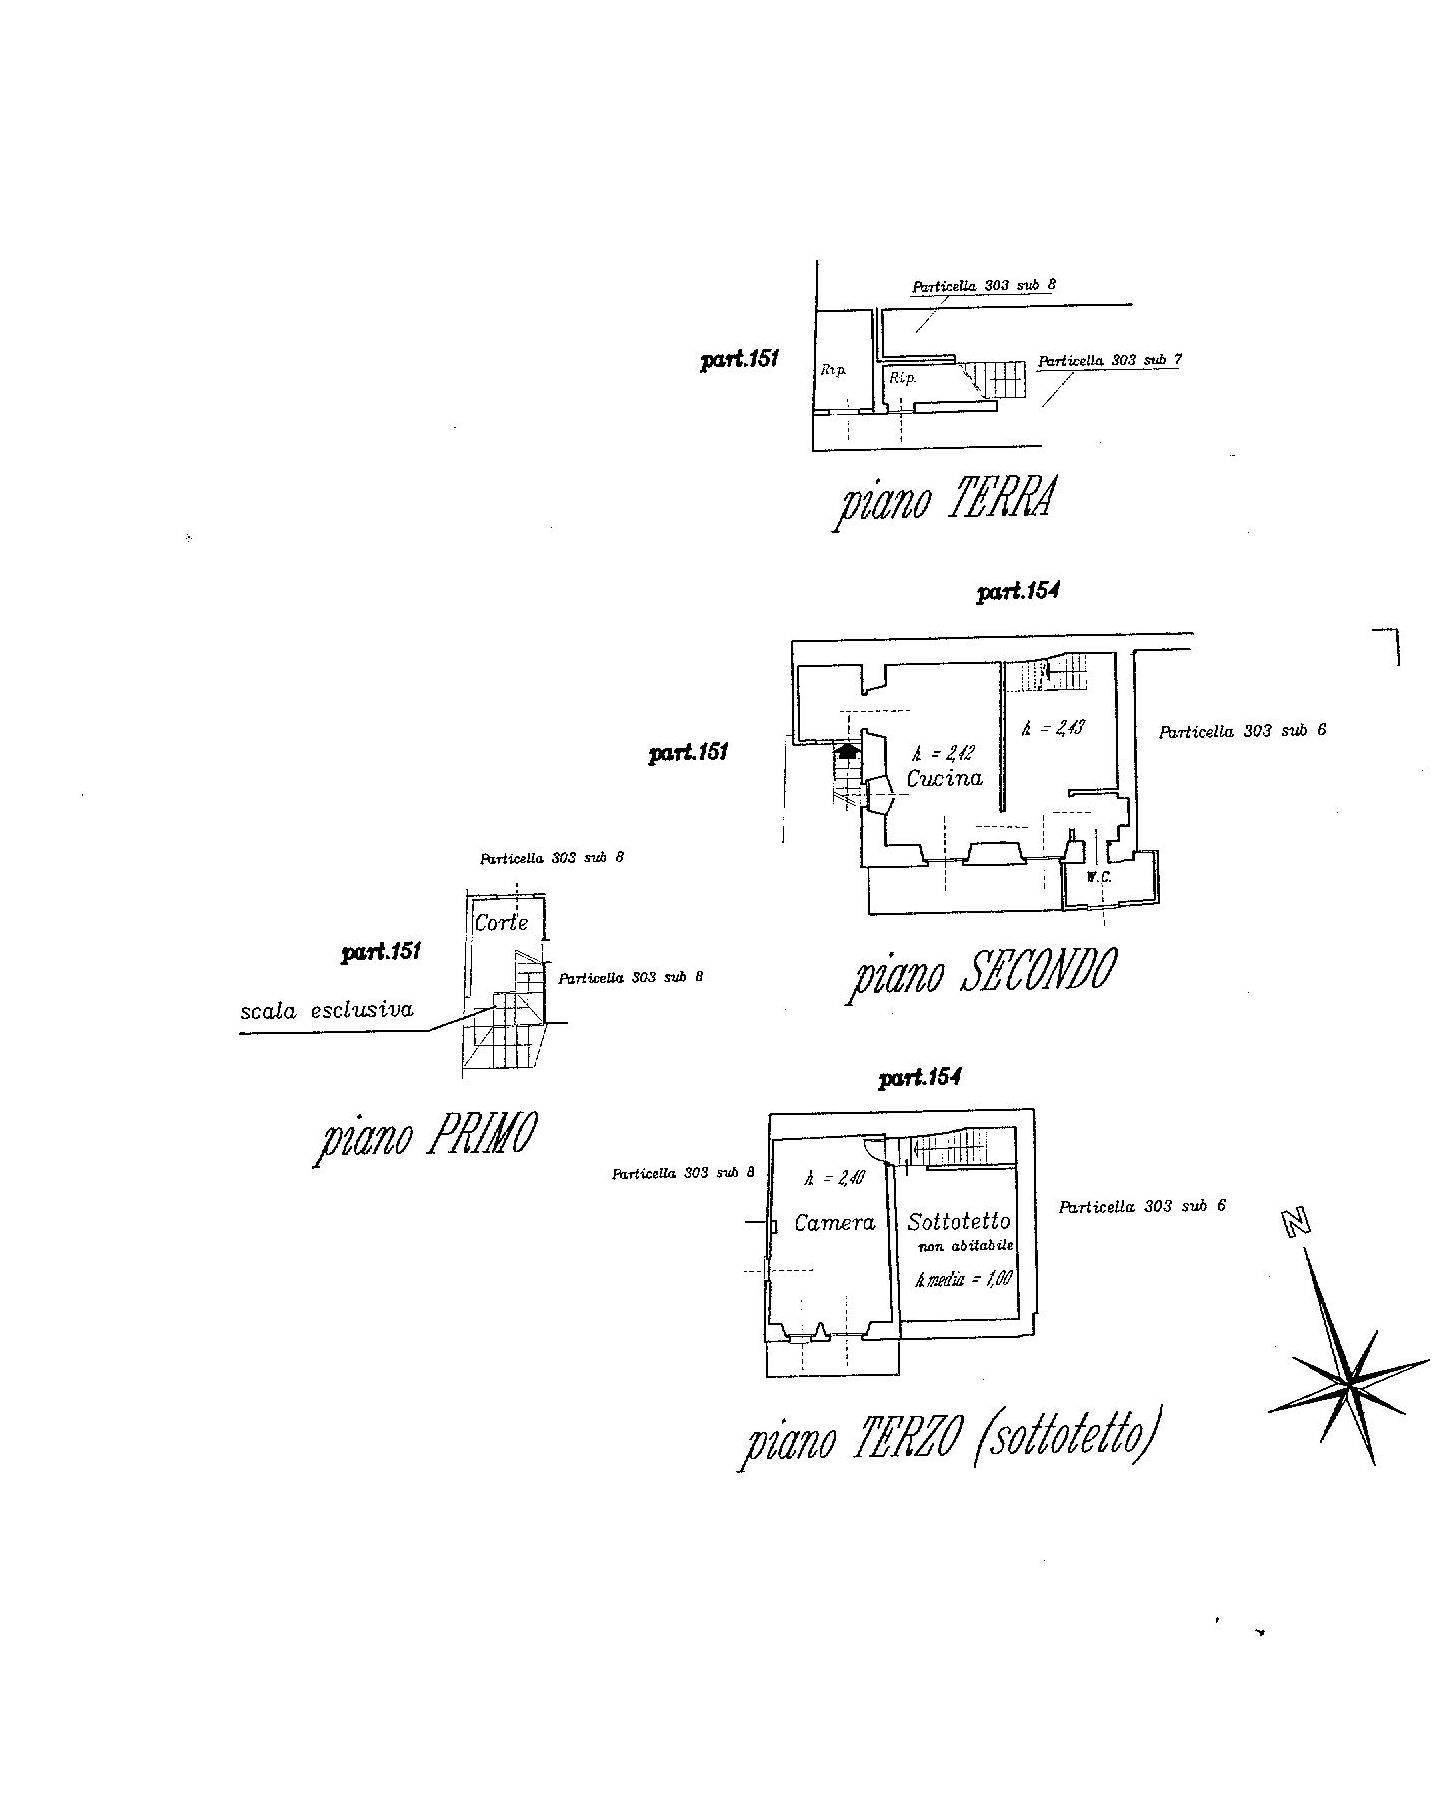 Appartamento in Vendita a Belgirate: 3 locali, 62 mq - Foto 27